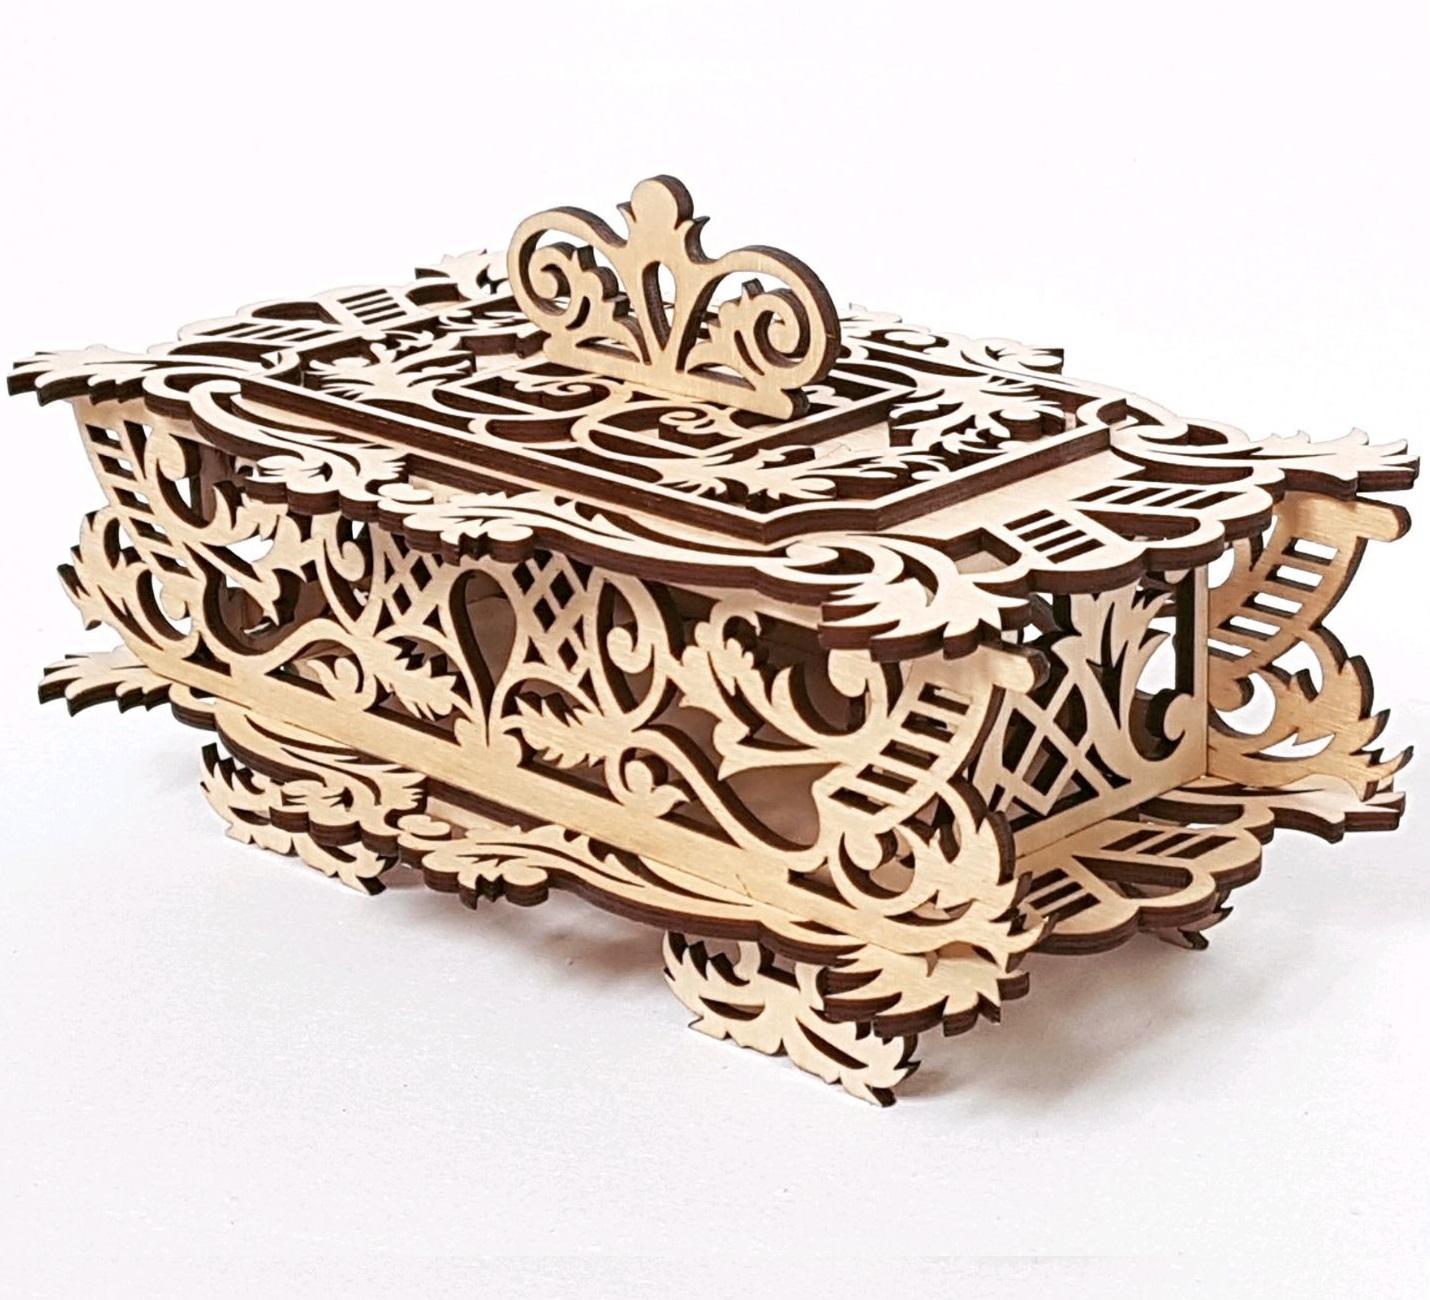 Laser Cut Decorative Wooden Basket With Lid DXF File